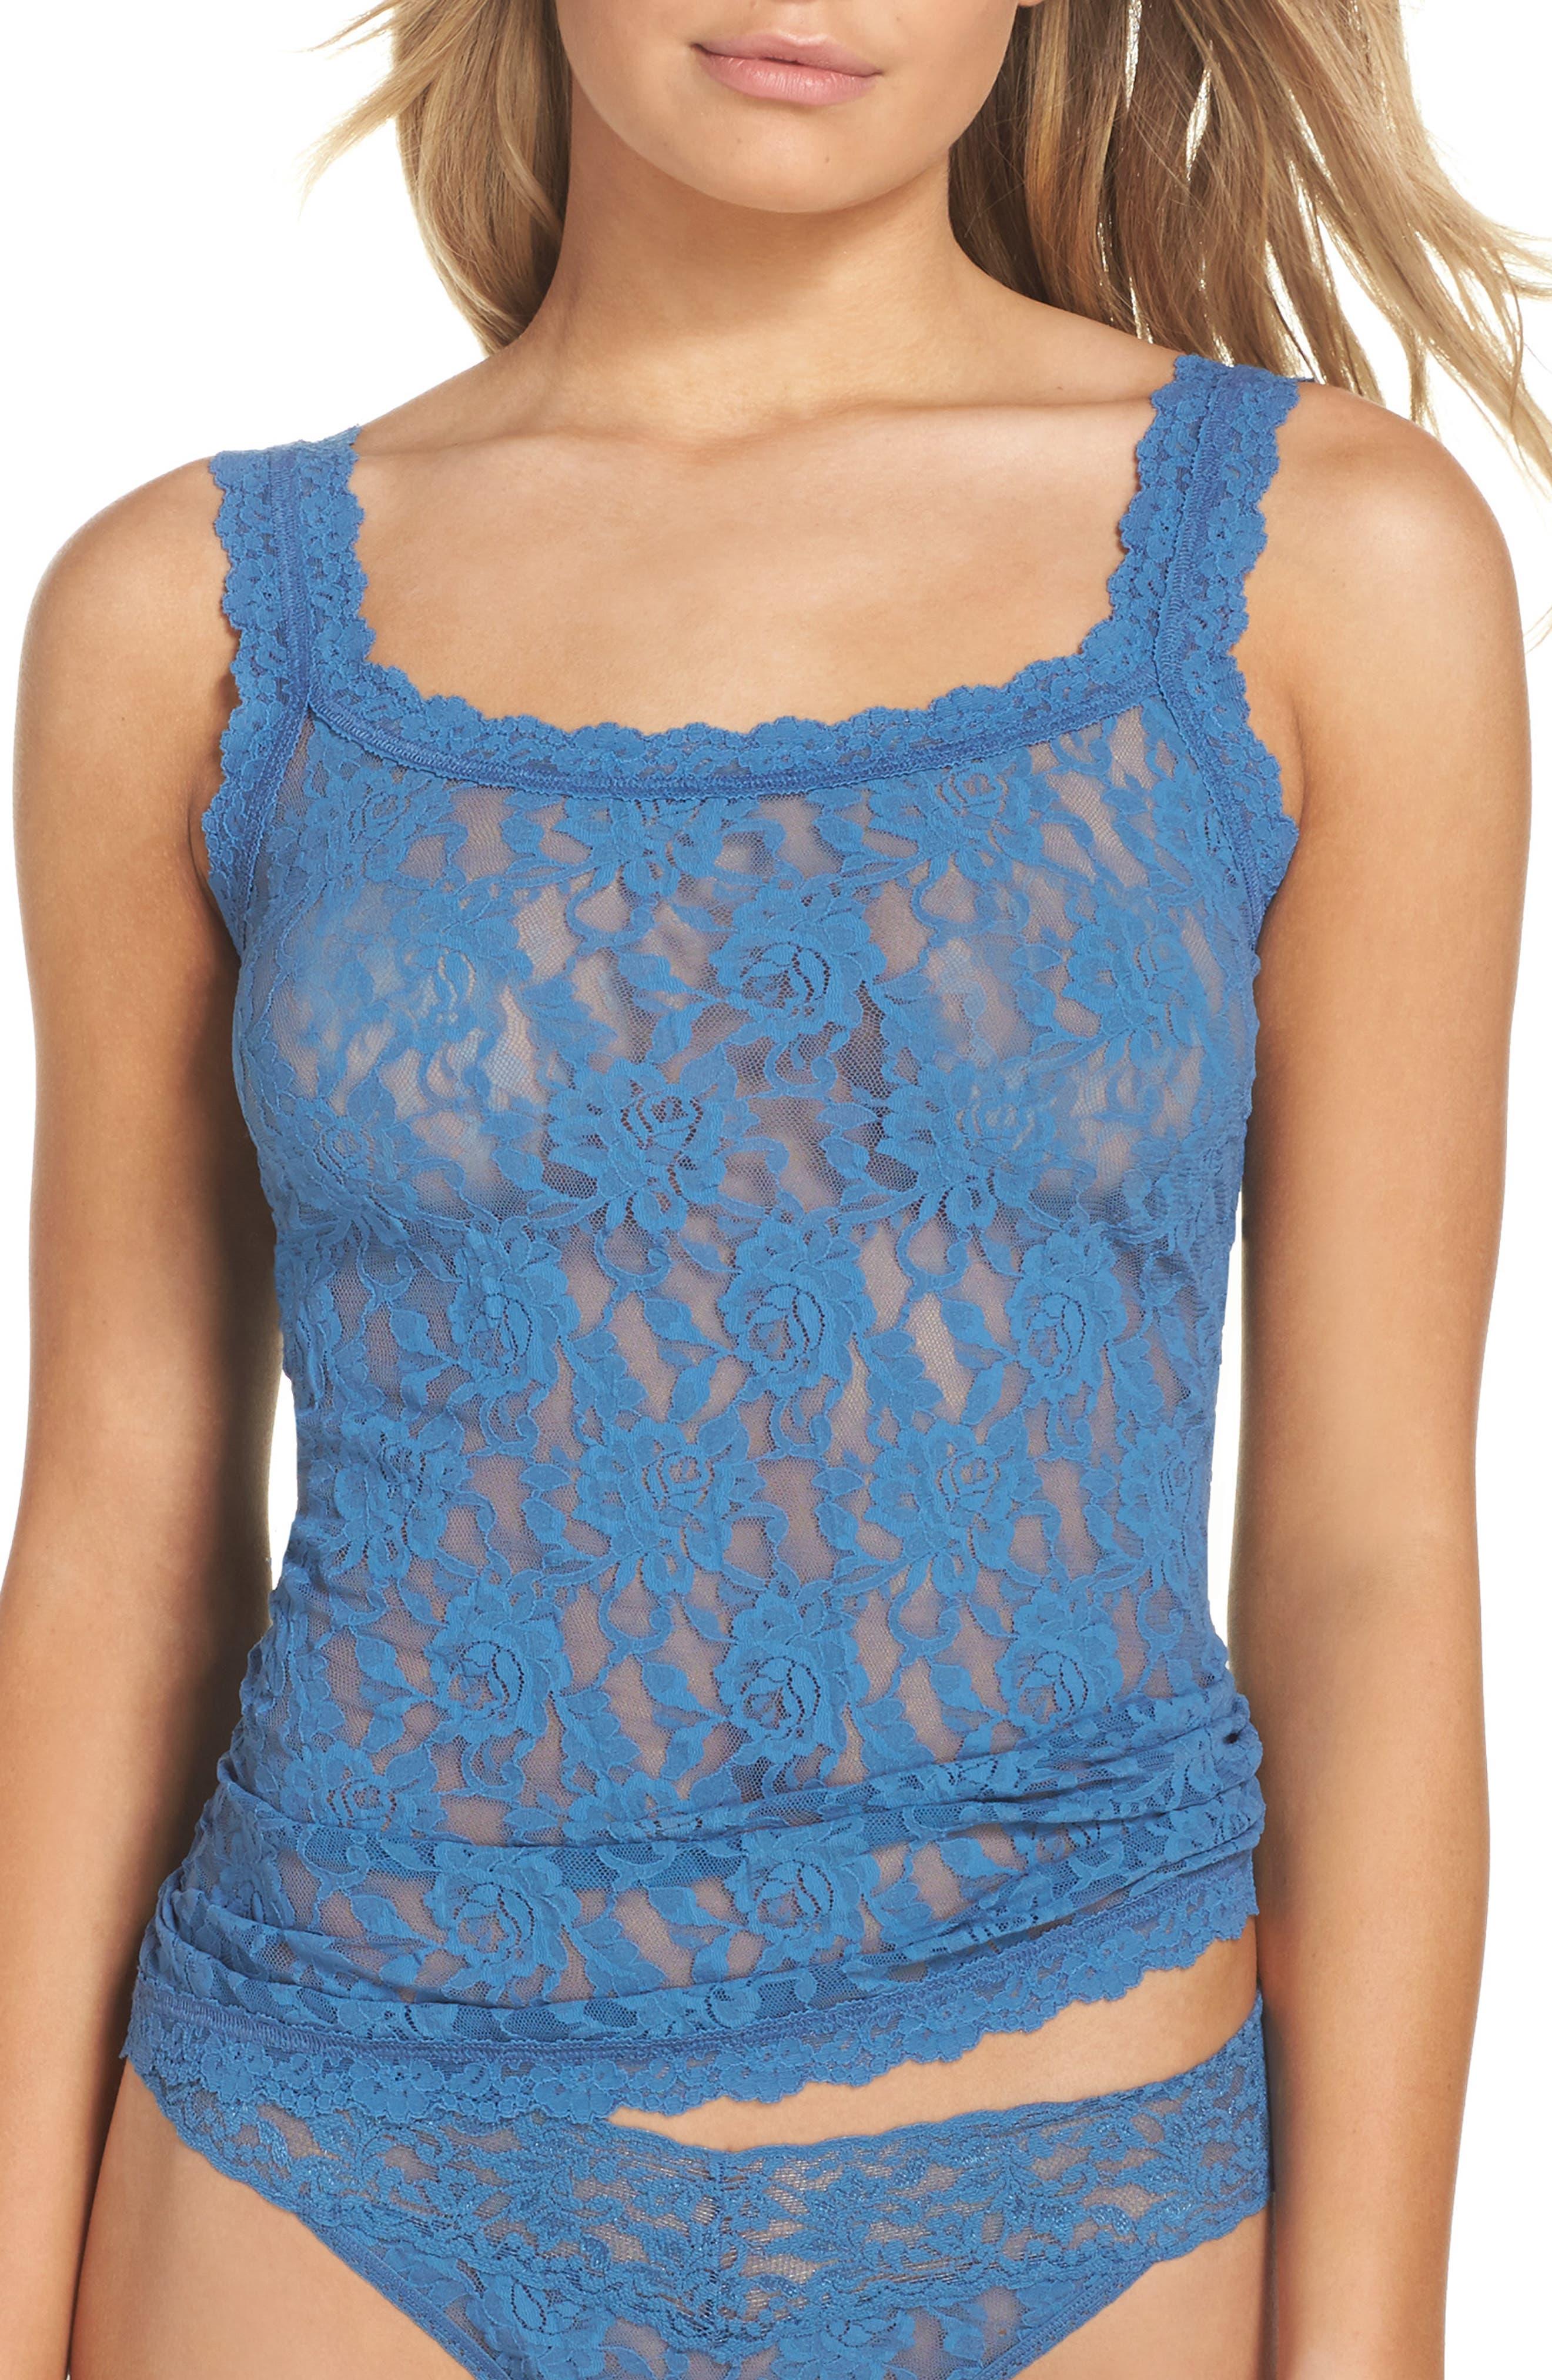 'Signature Lace' Camisole,                         Main,                         color, 401